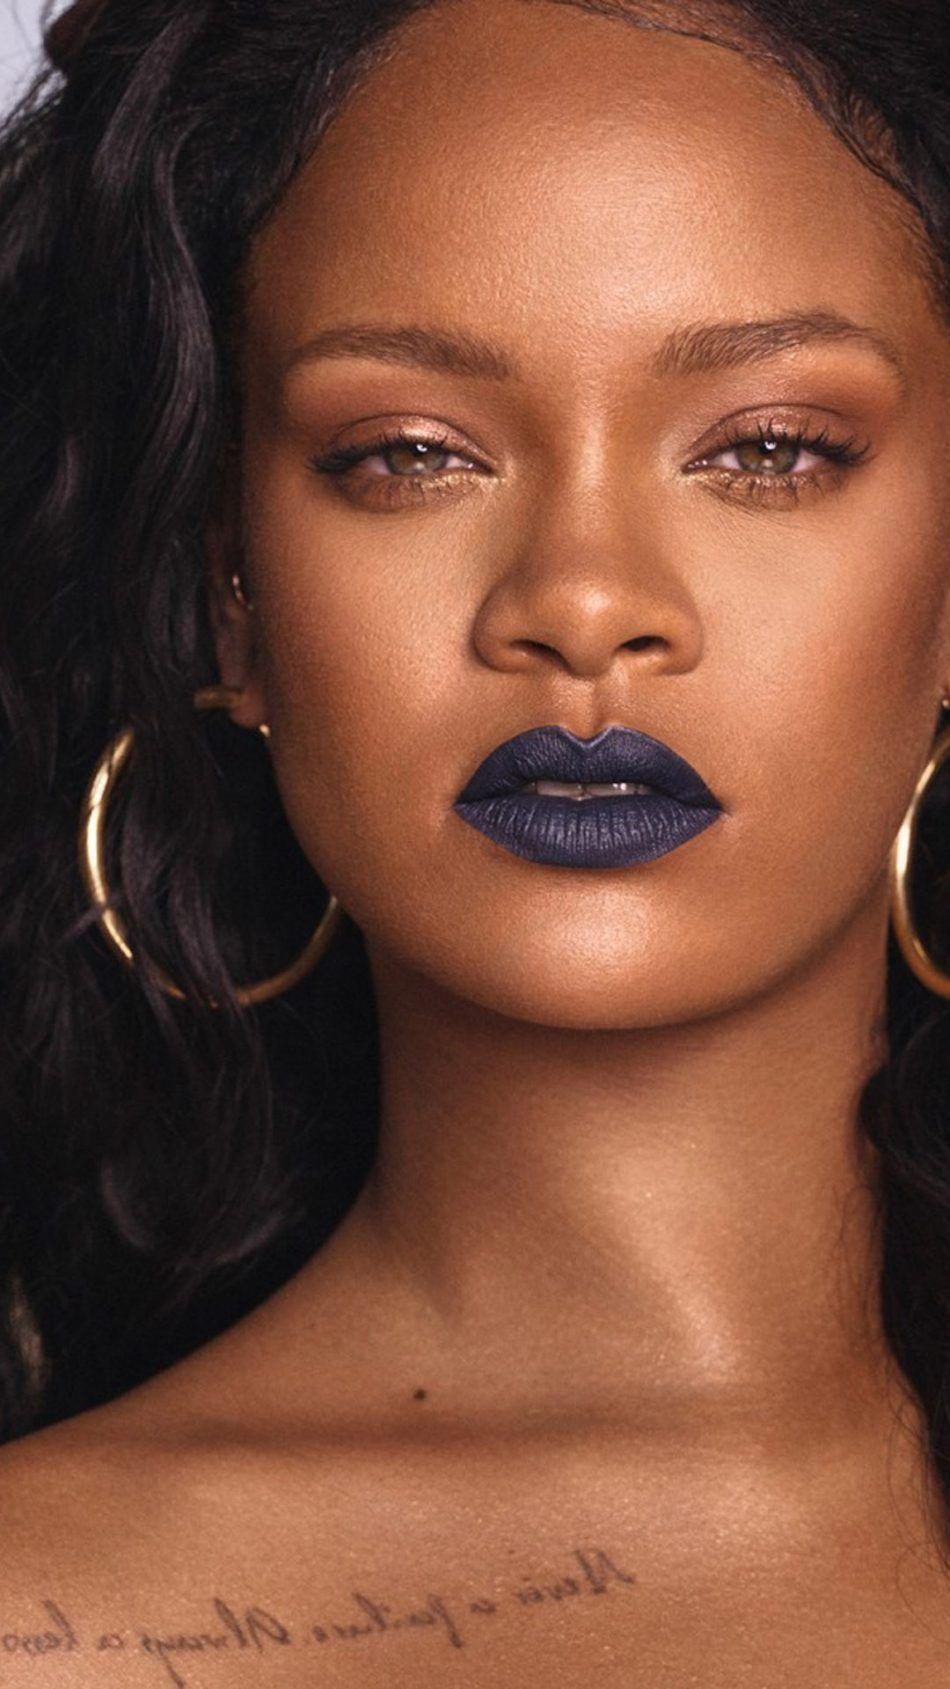 Rihanna Love Rihanna, Looks, Música americana